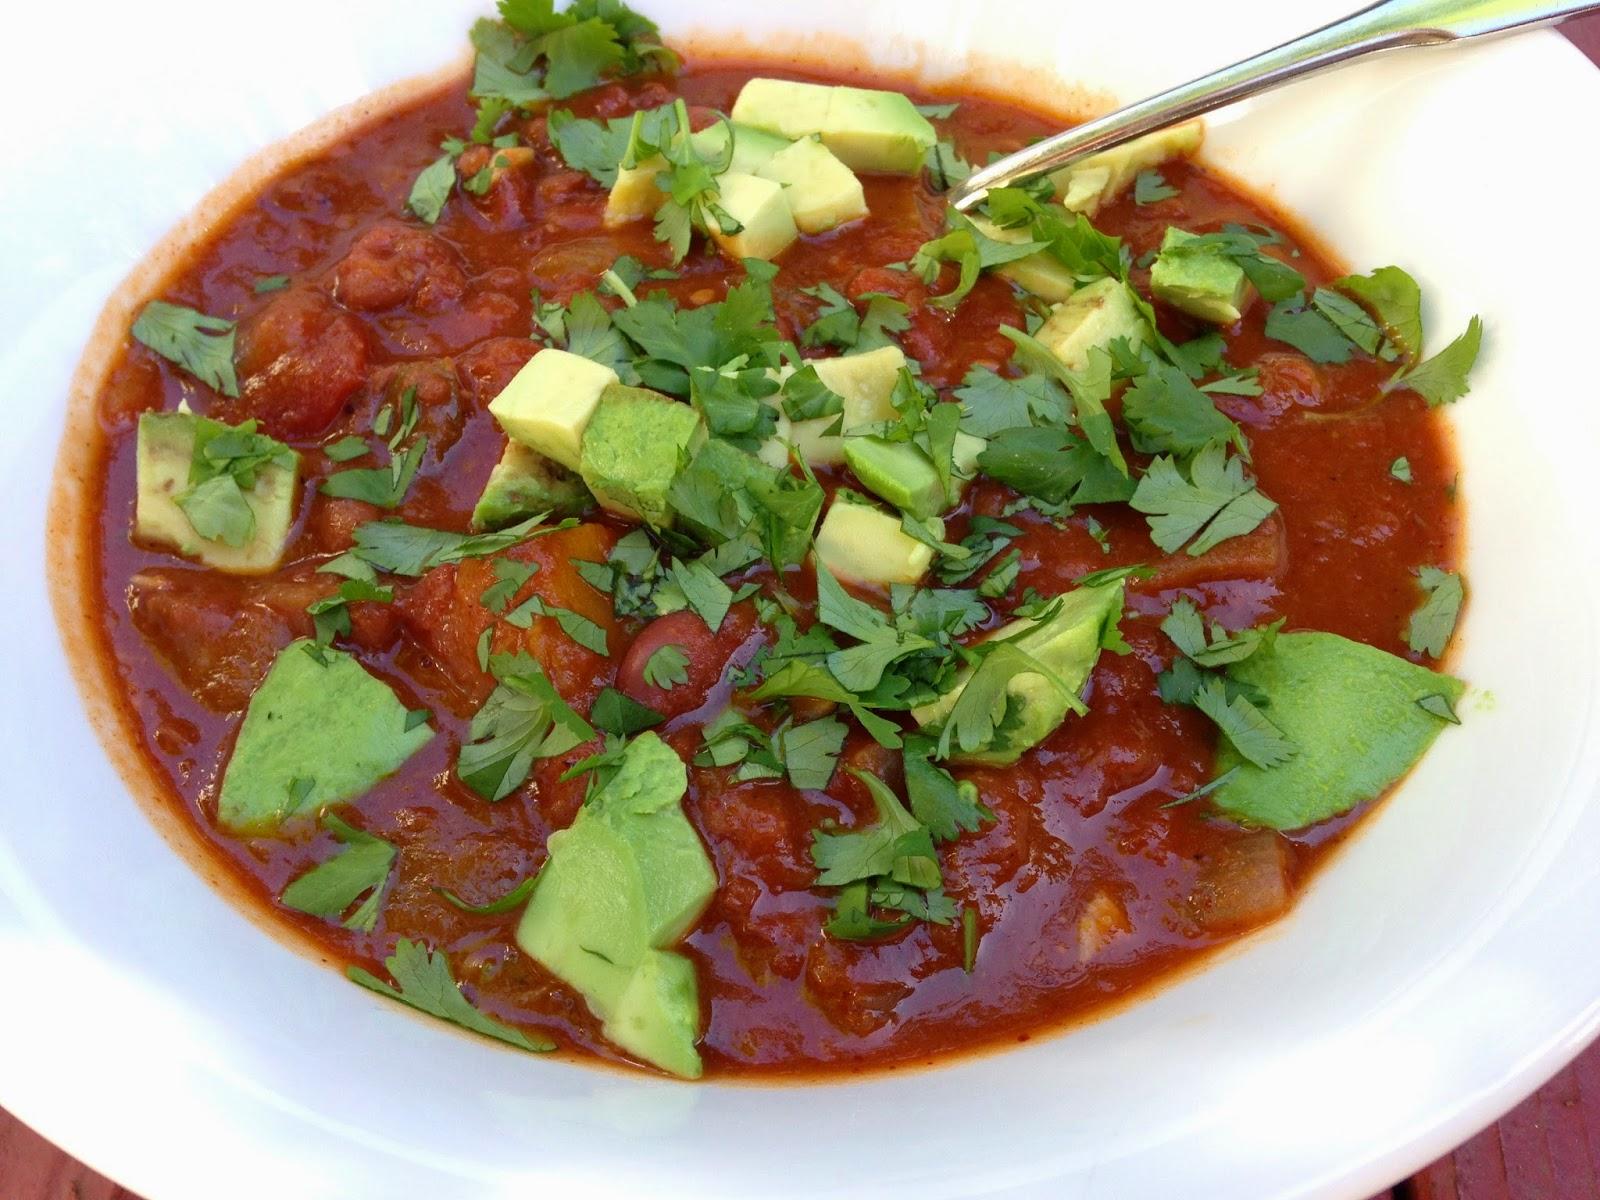 Chef in Residency: Simple Vegetarian Chili